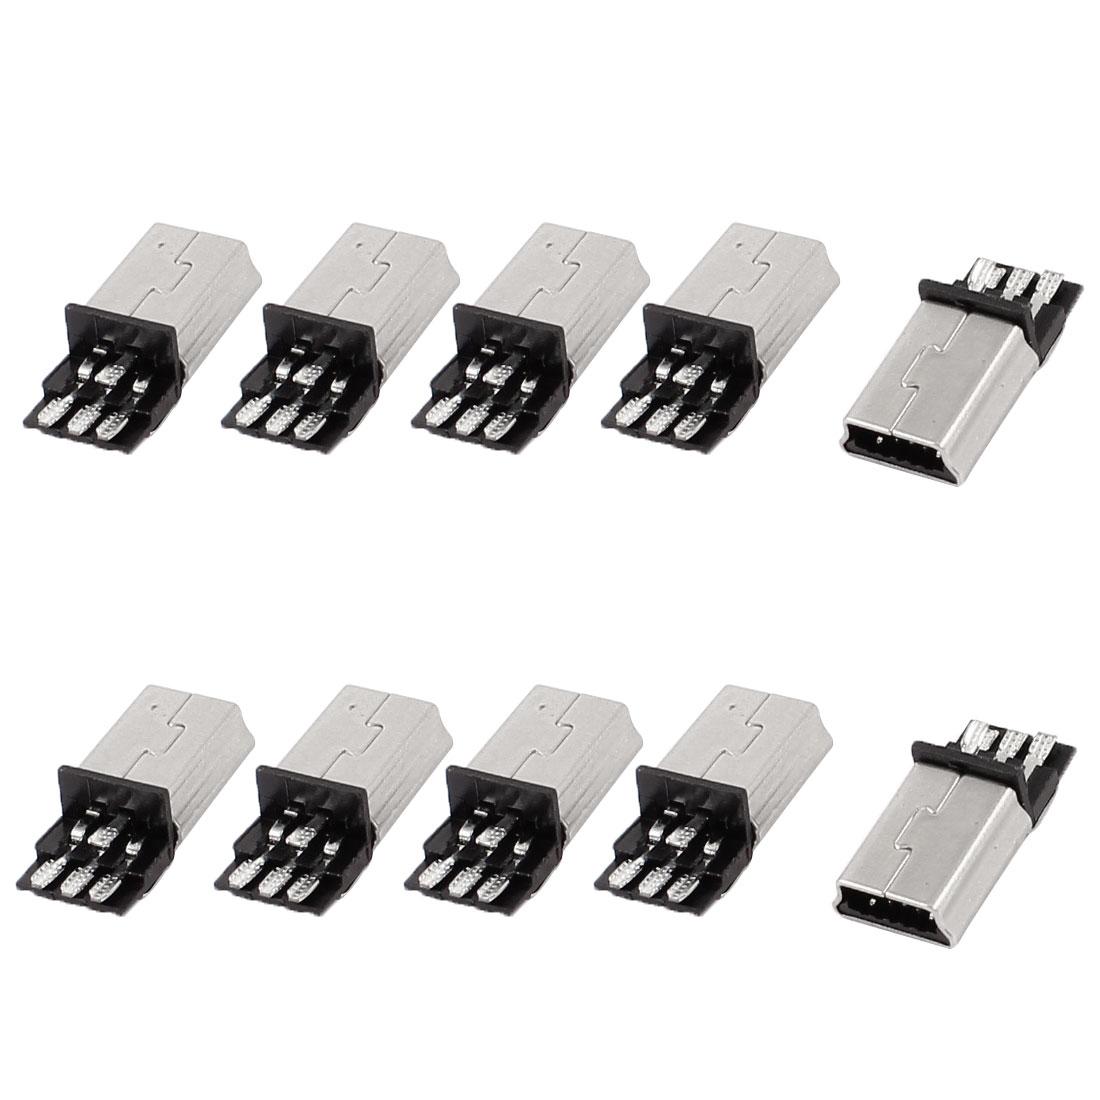 10 Pcs Mini USB 5Pin Type B Male Connector PCB Mount Solder Plug Jack